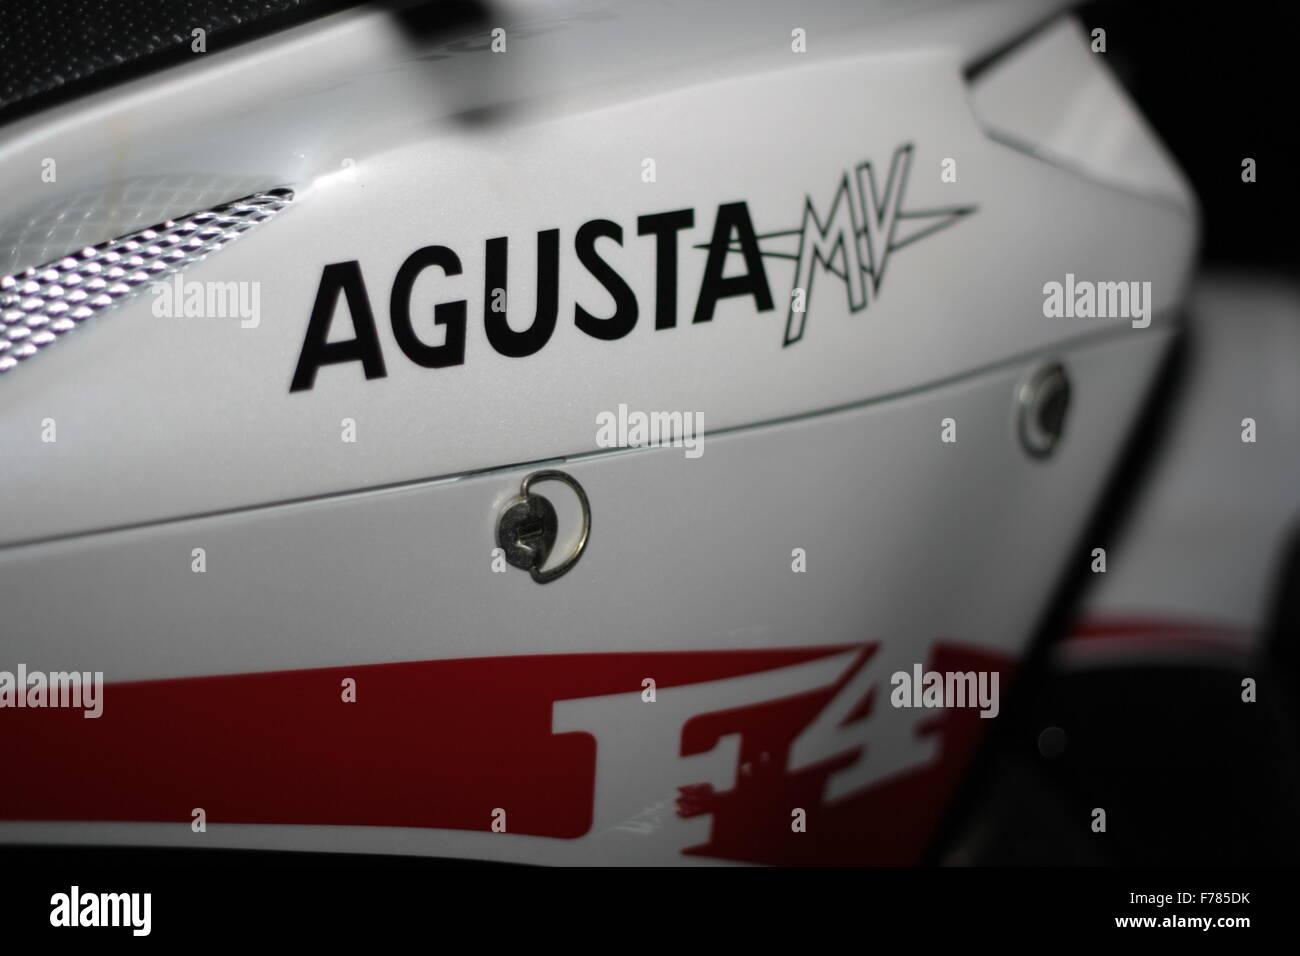 MV AGUSTA F4 Logo moto close up Banque D'Images